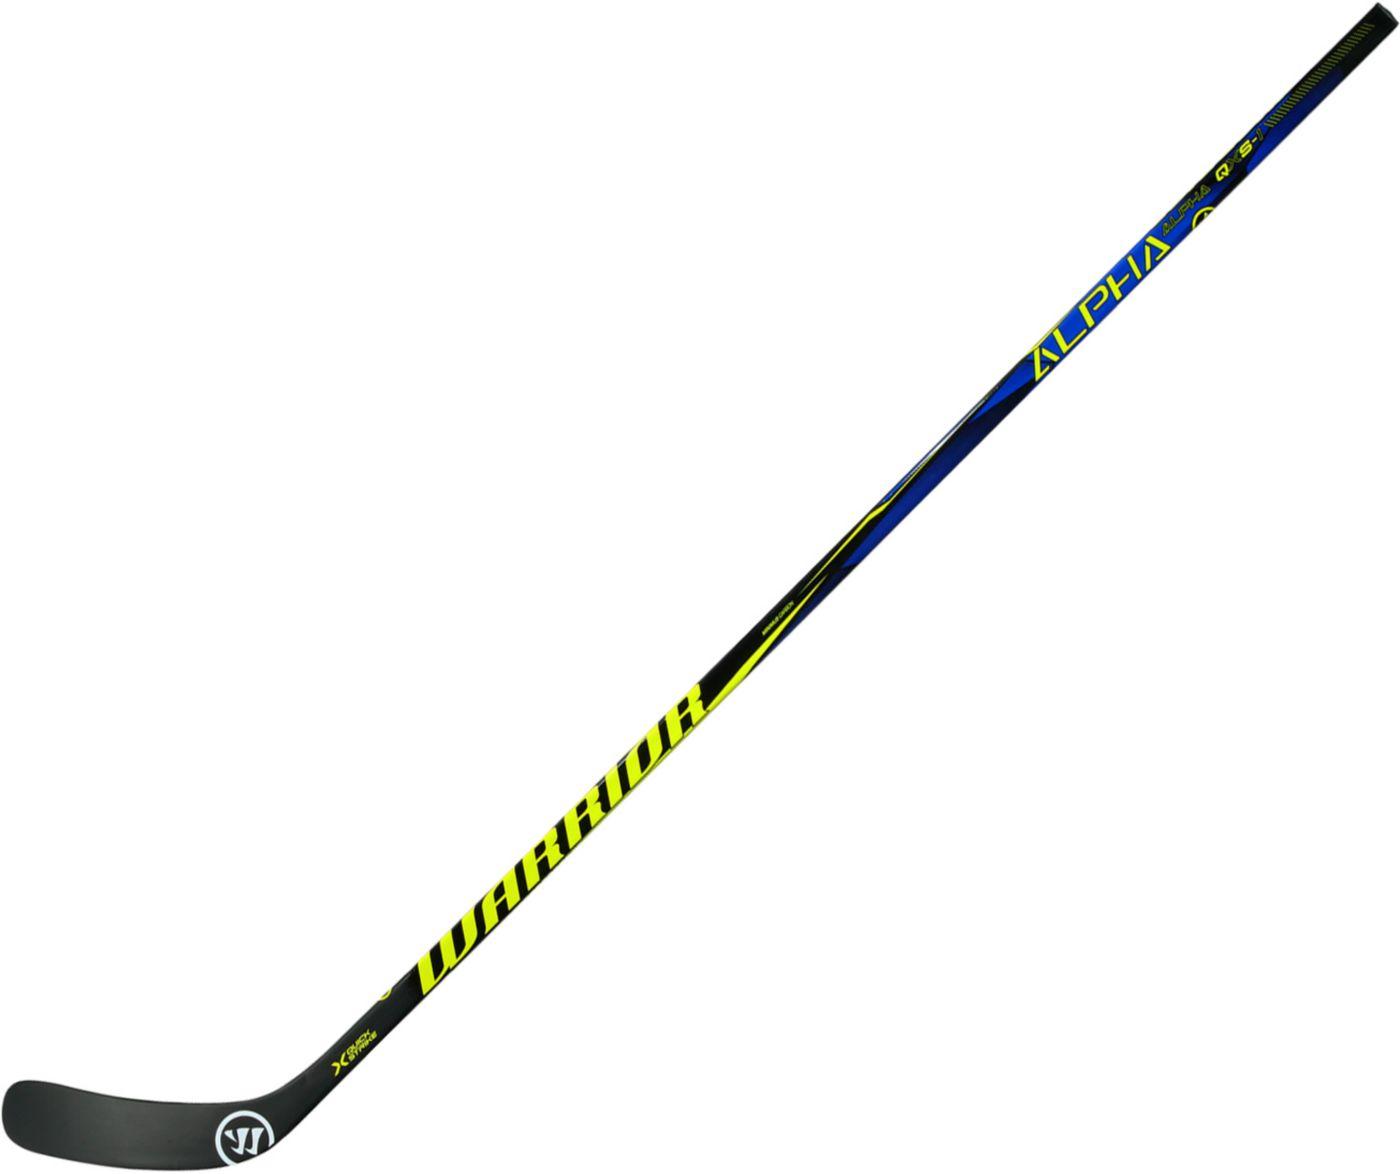 Warrior Senior Alpha QXS-1 Ice Hockey Stick